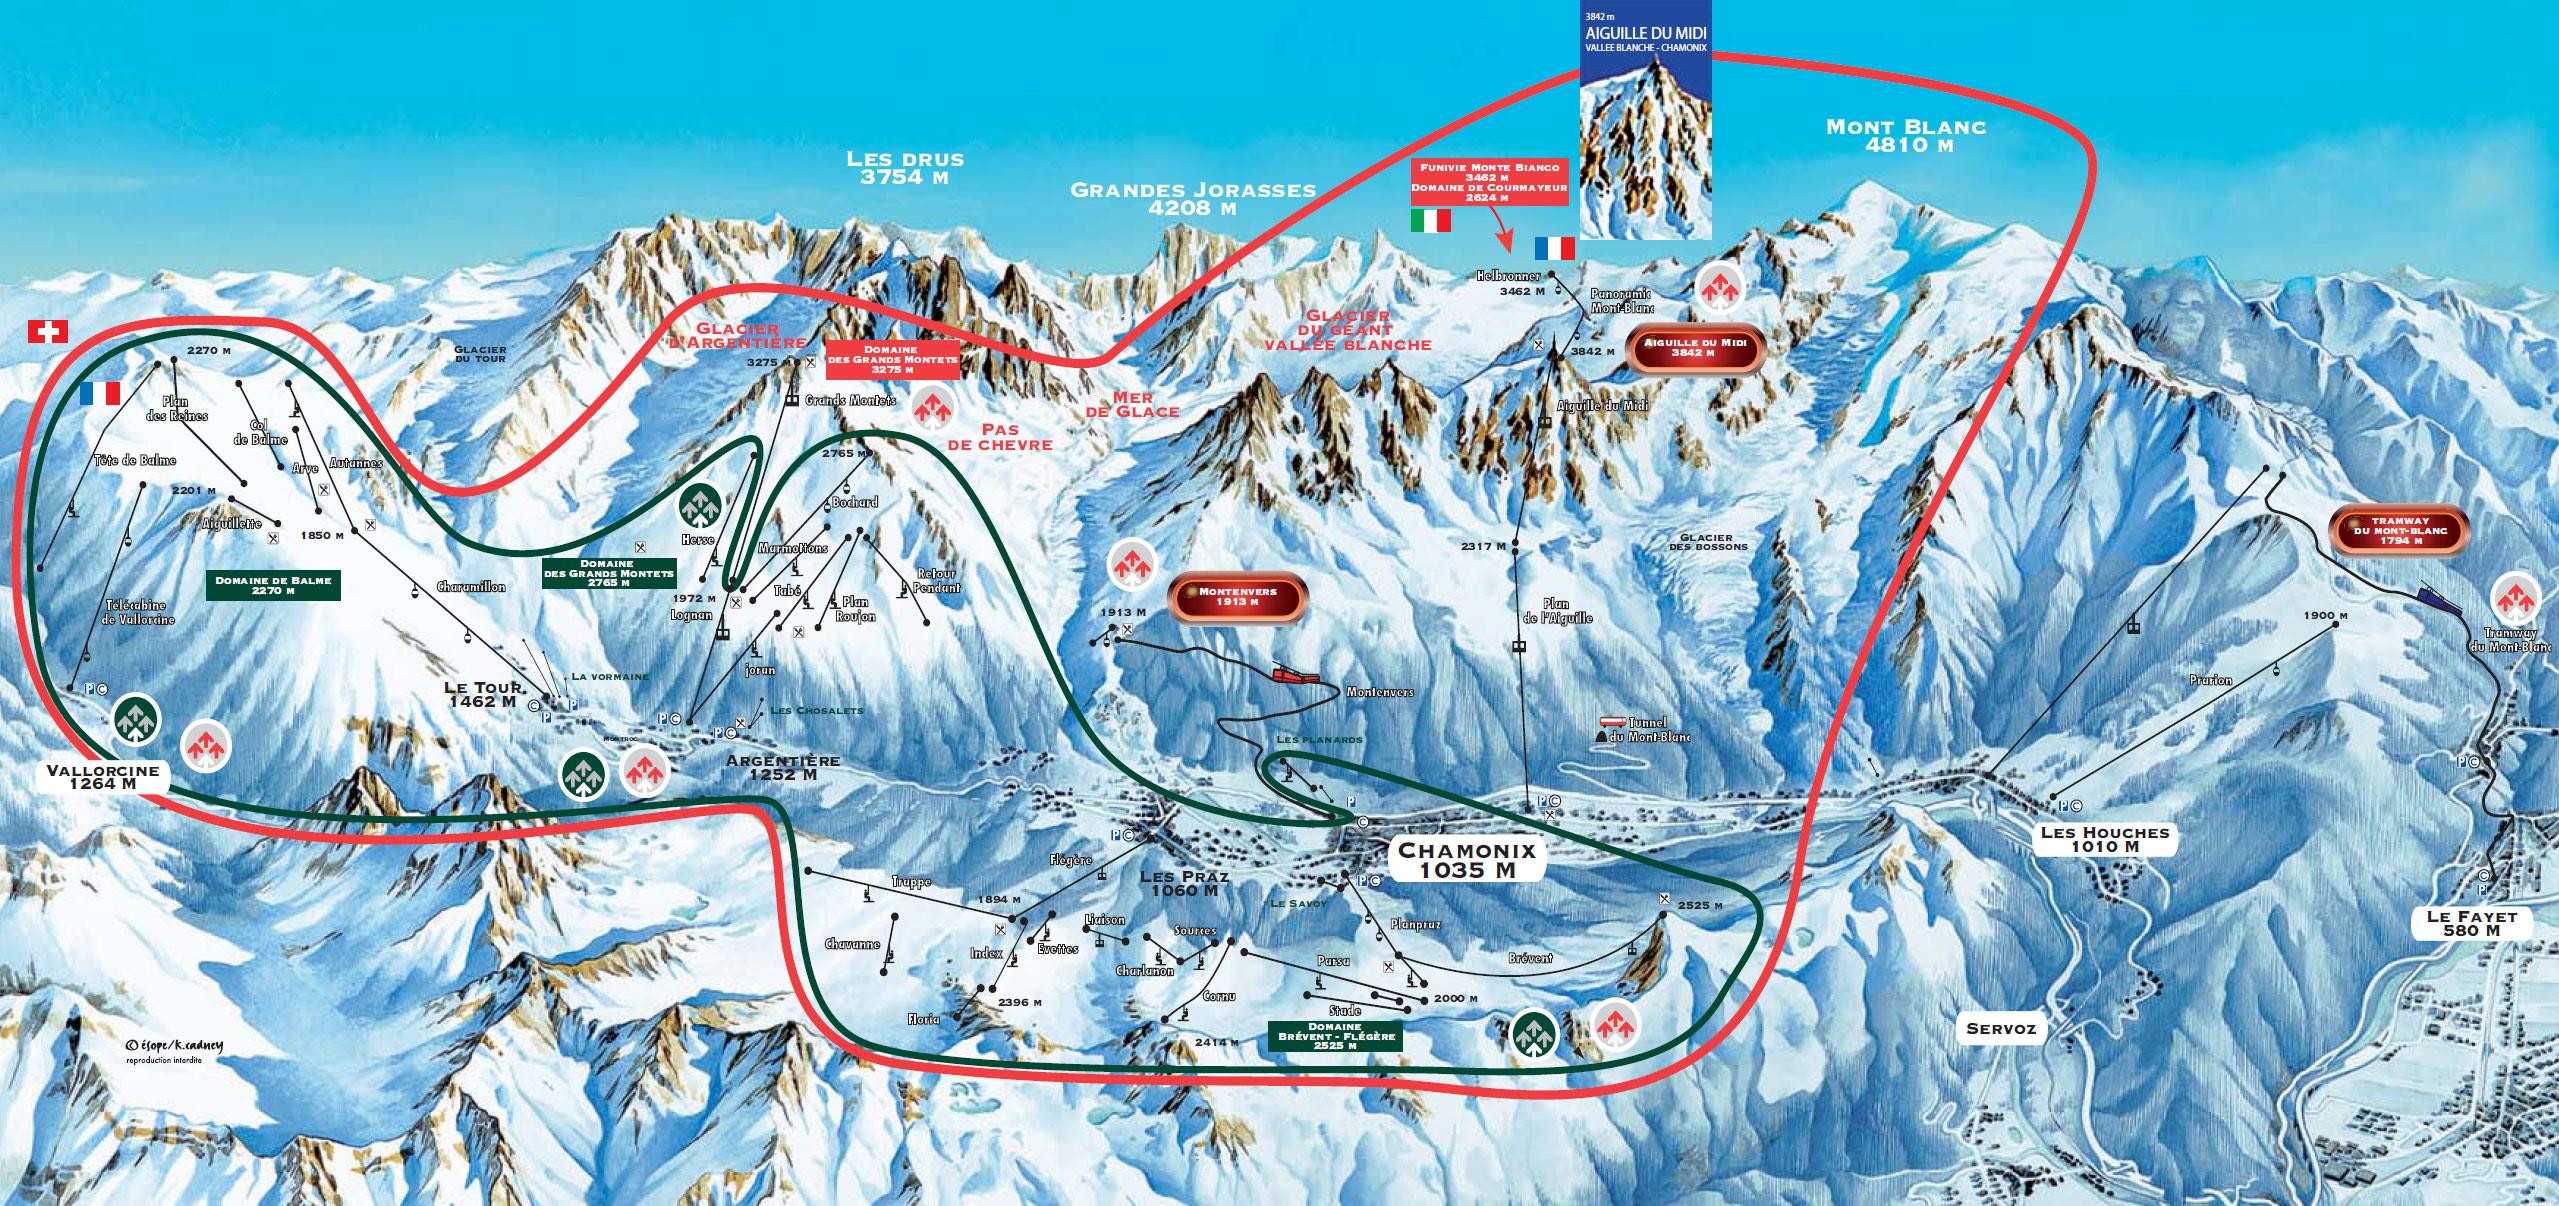 Chamonix Cartina Geografica.Cartina Chamonix Mappa Piste Di Sci Chamonix Dove Sciare